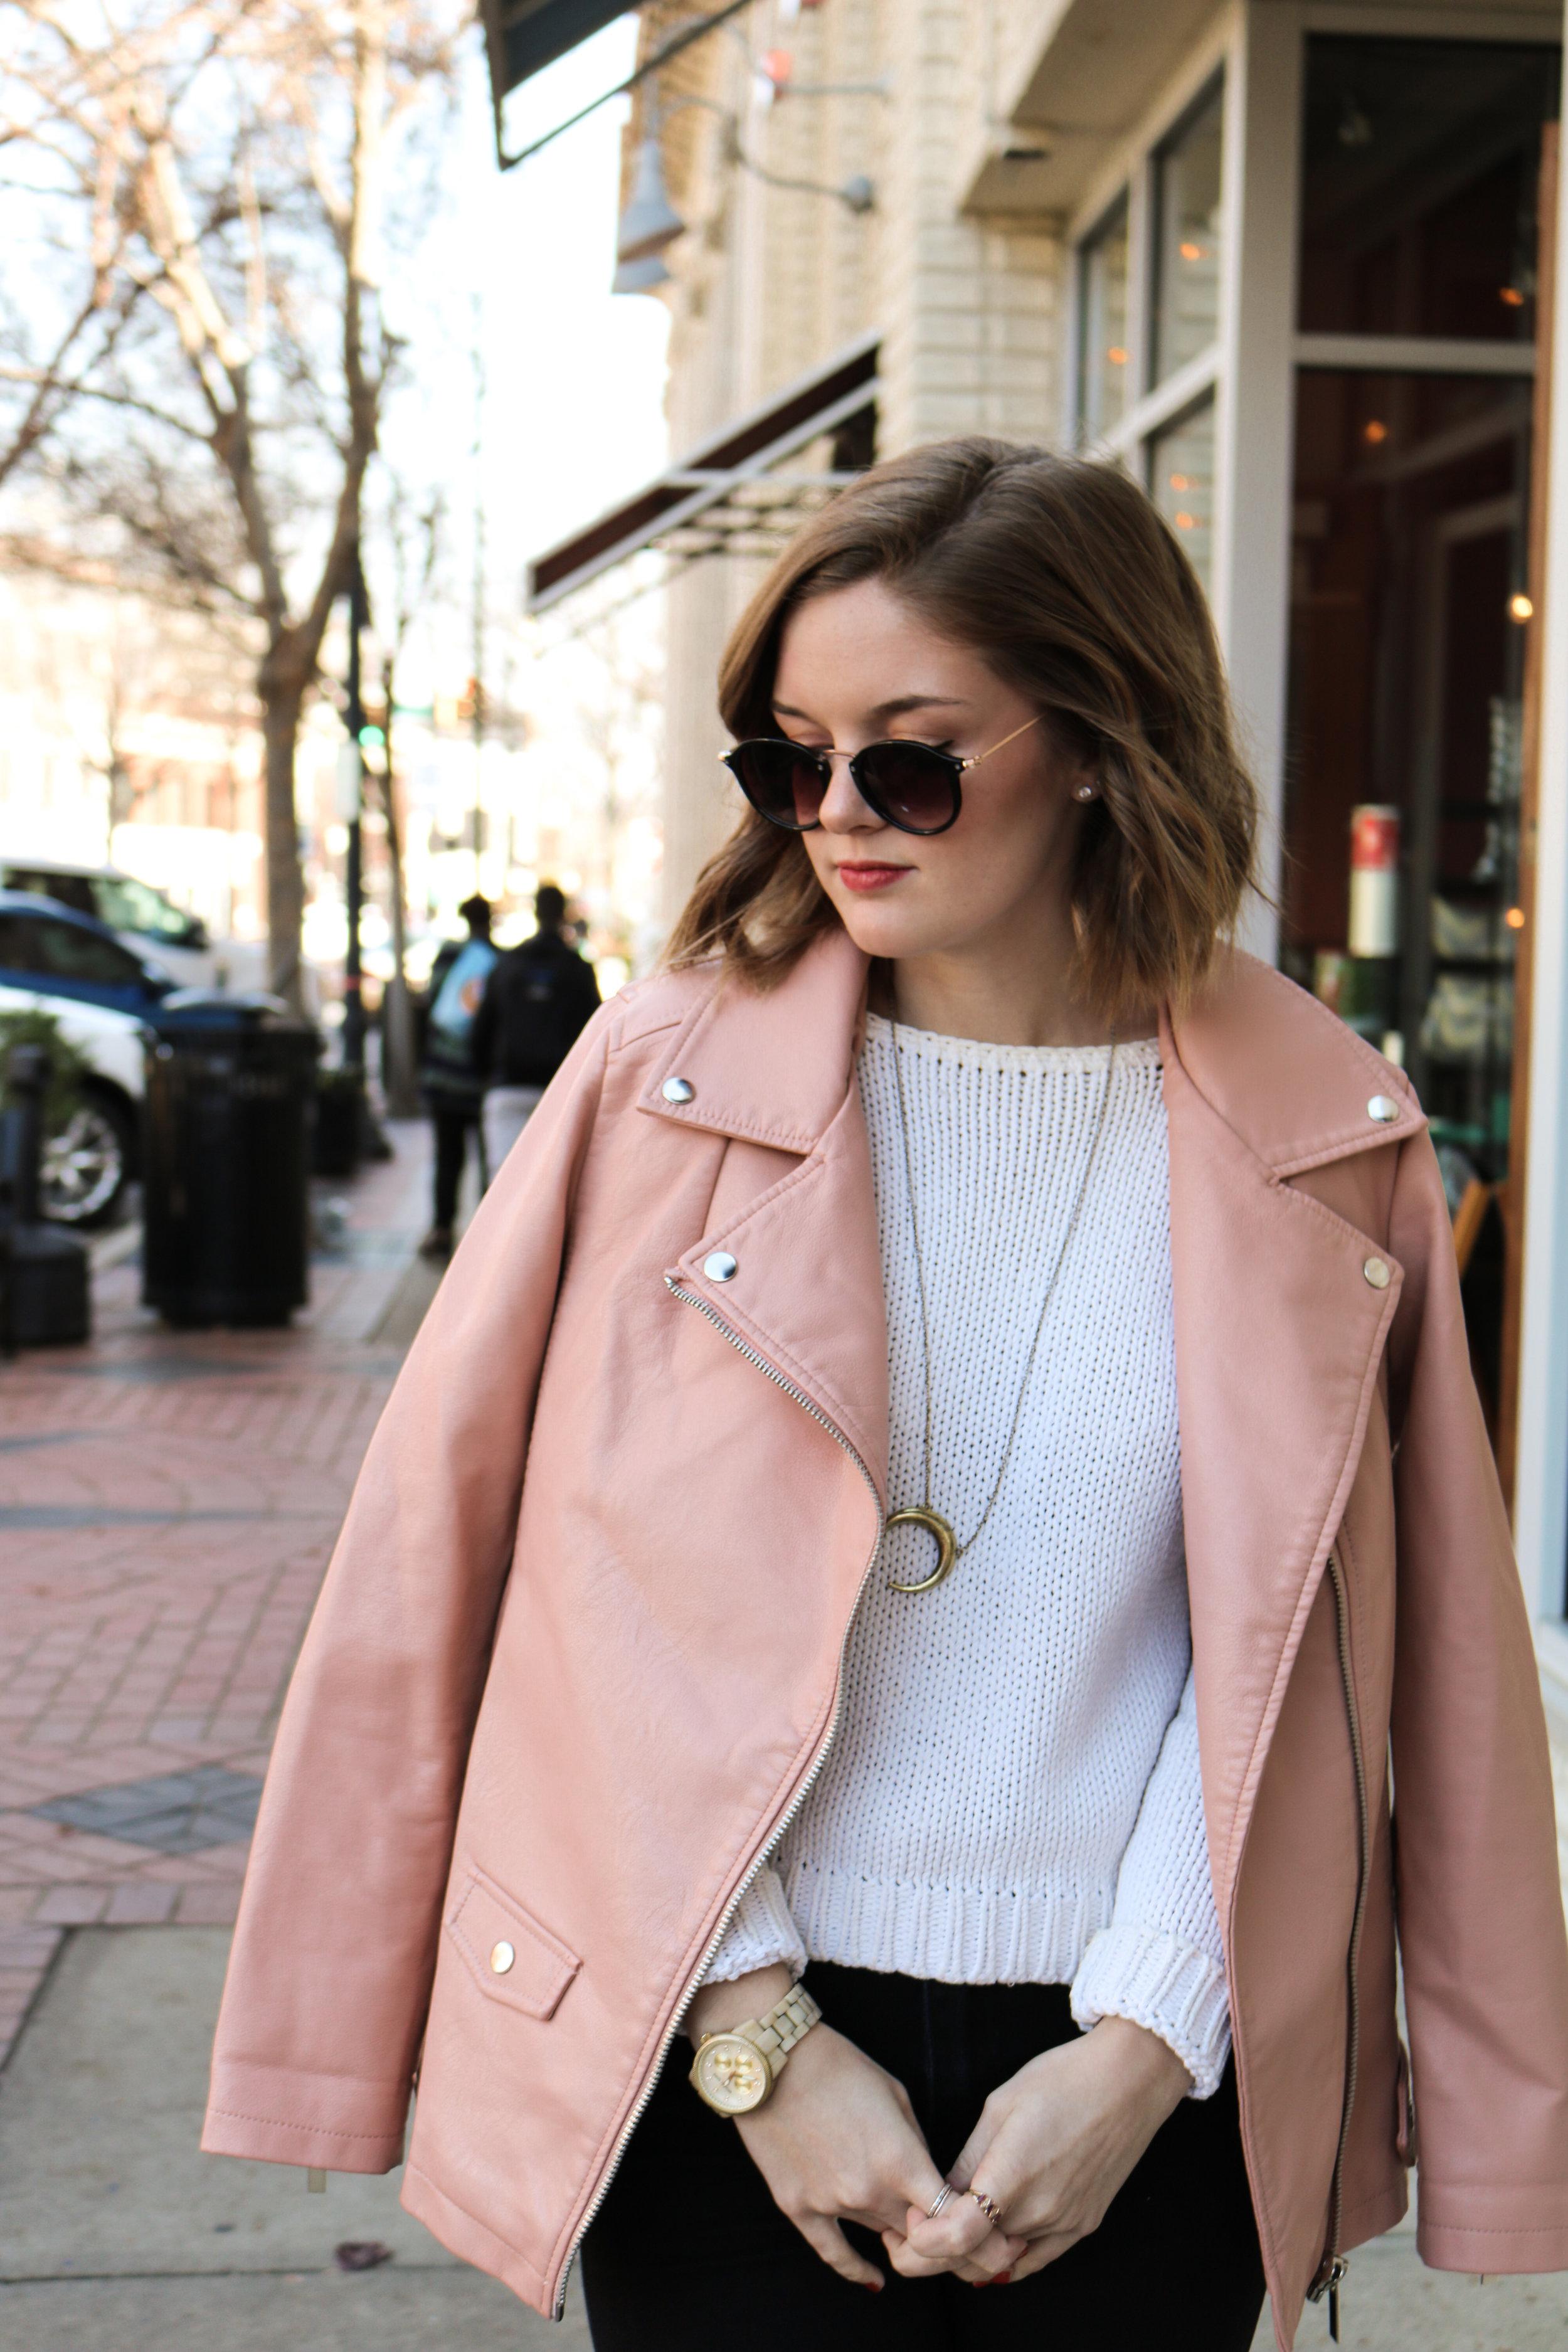 pinkjacket-fpsweater.jpg